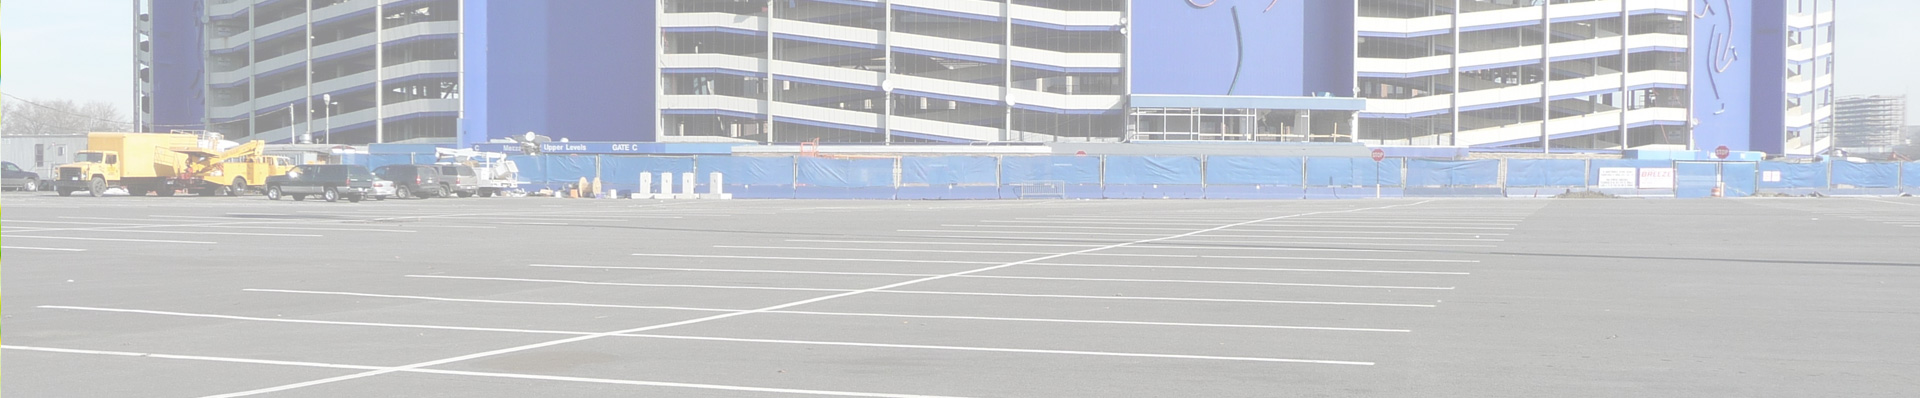 polarbear_stadium